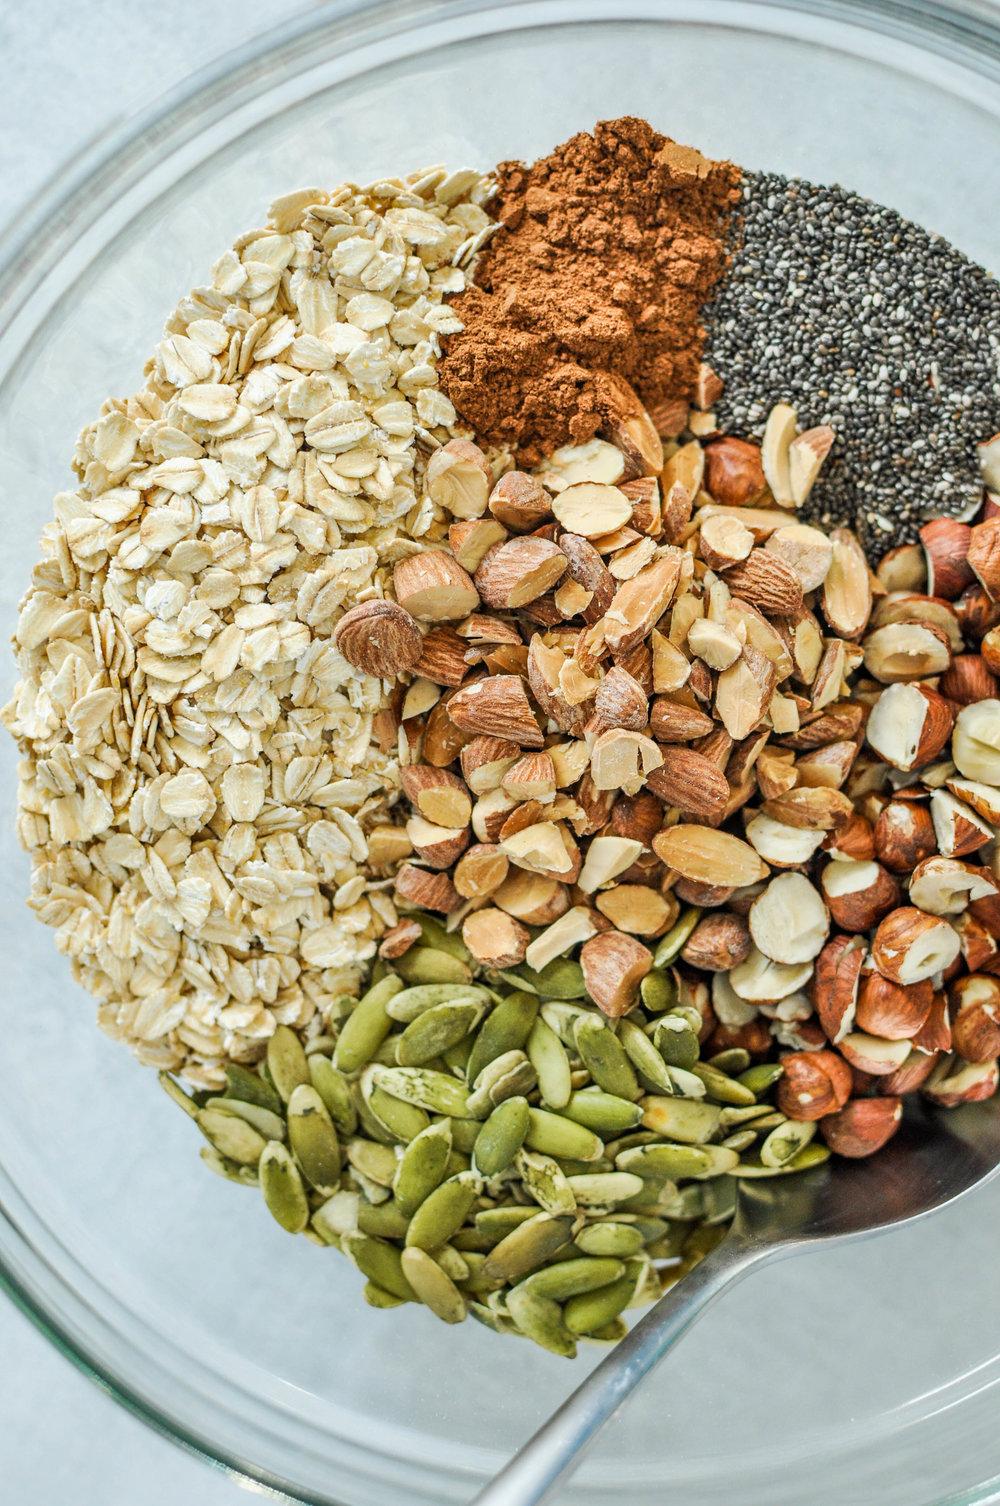 Best Ever Homemade Granola Recipe. Dry Granola Ingredients.